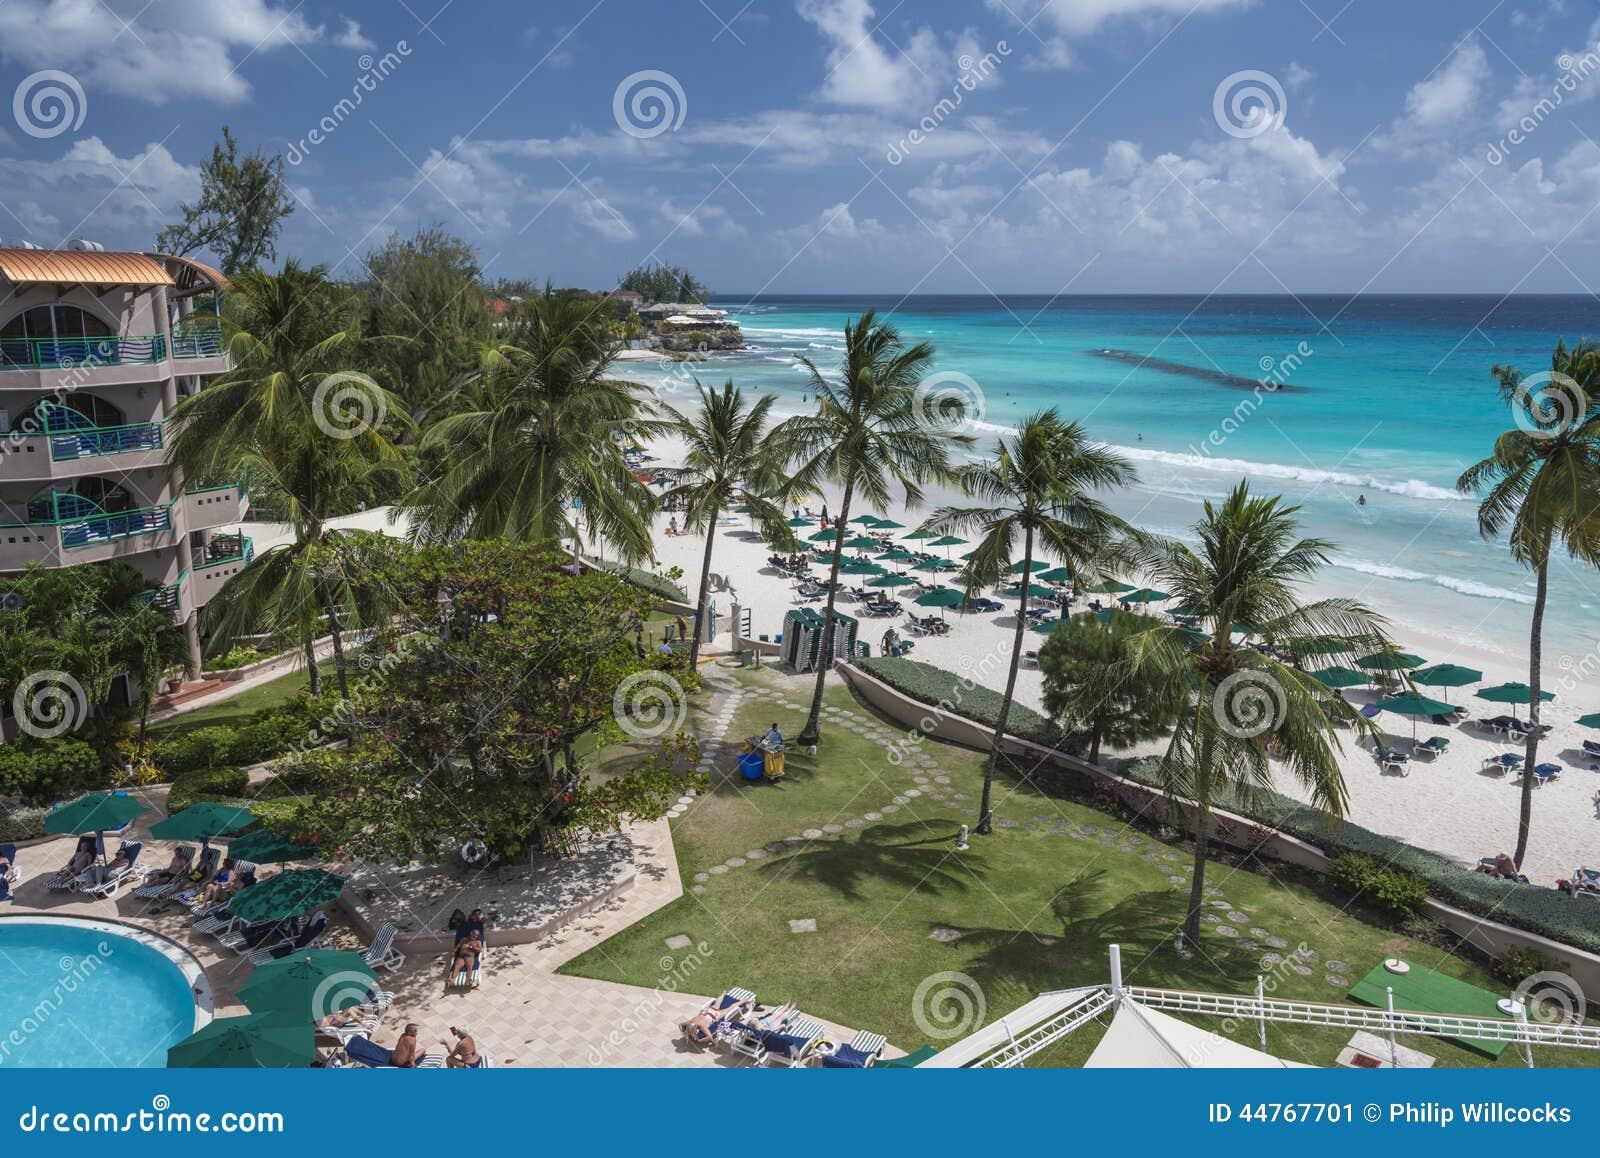 Accra Beach Hotel Amp Spa